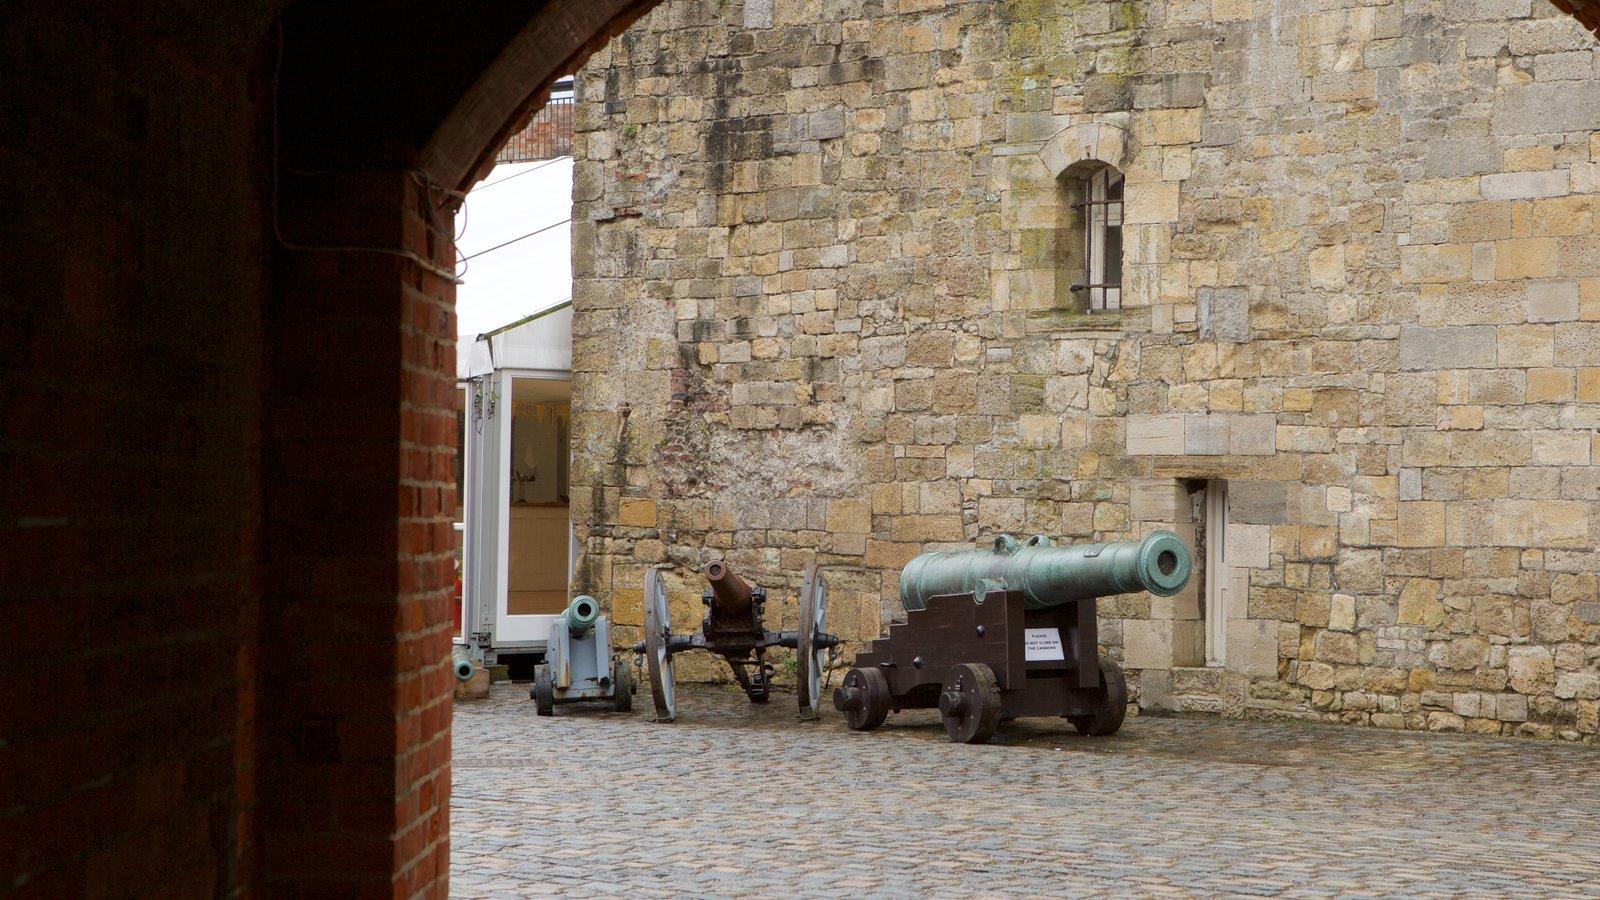 Southsea Castle caracterizando elementos de patrimônio e um castelo